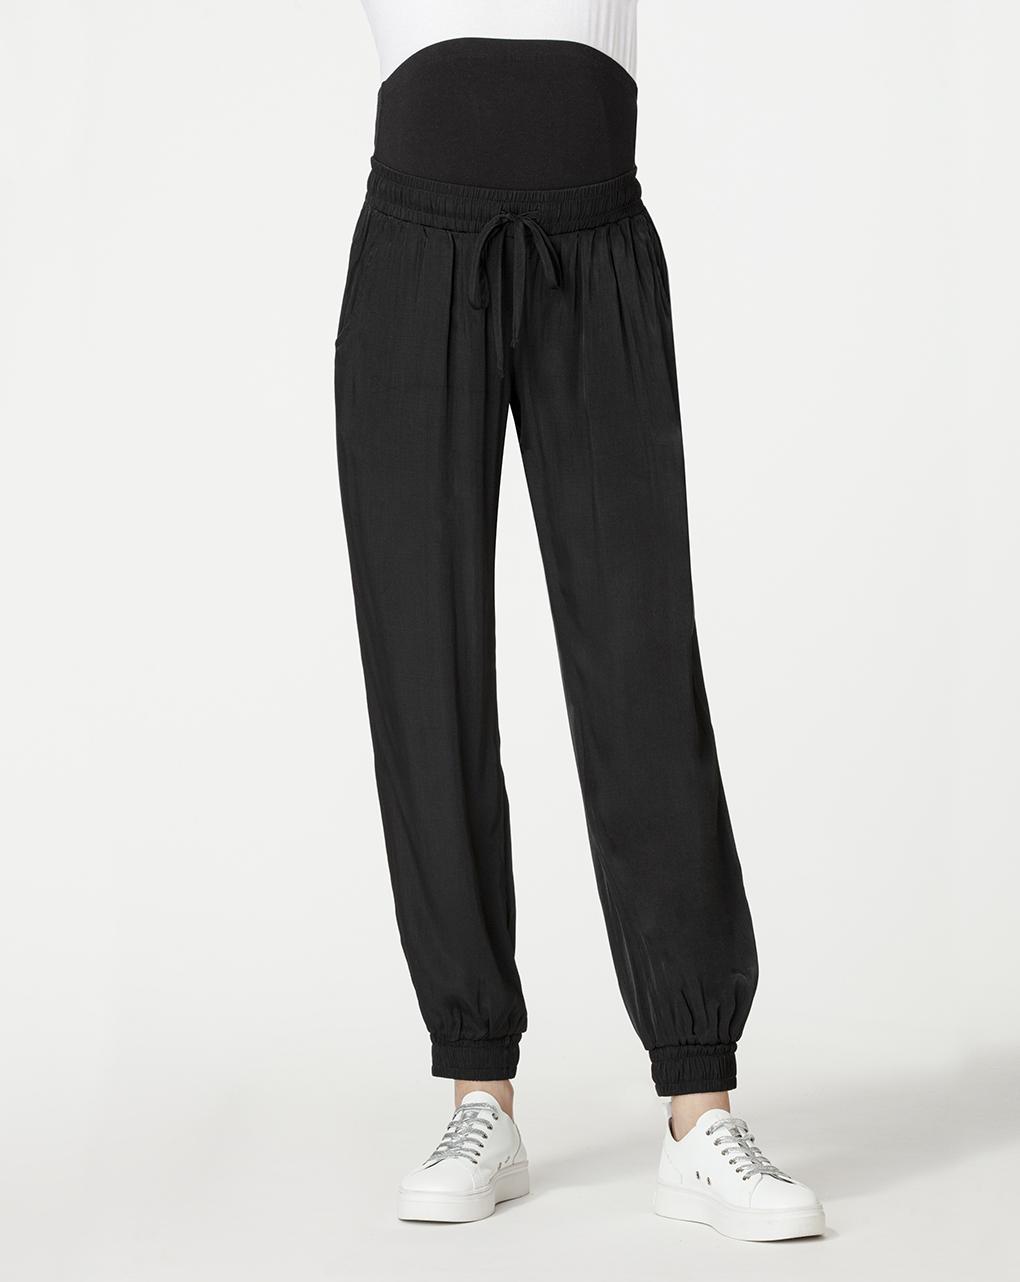 Pantaloni premaman neri - Prénatal